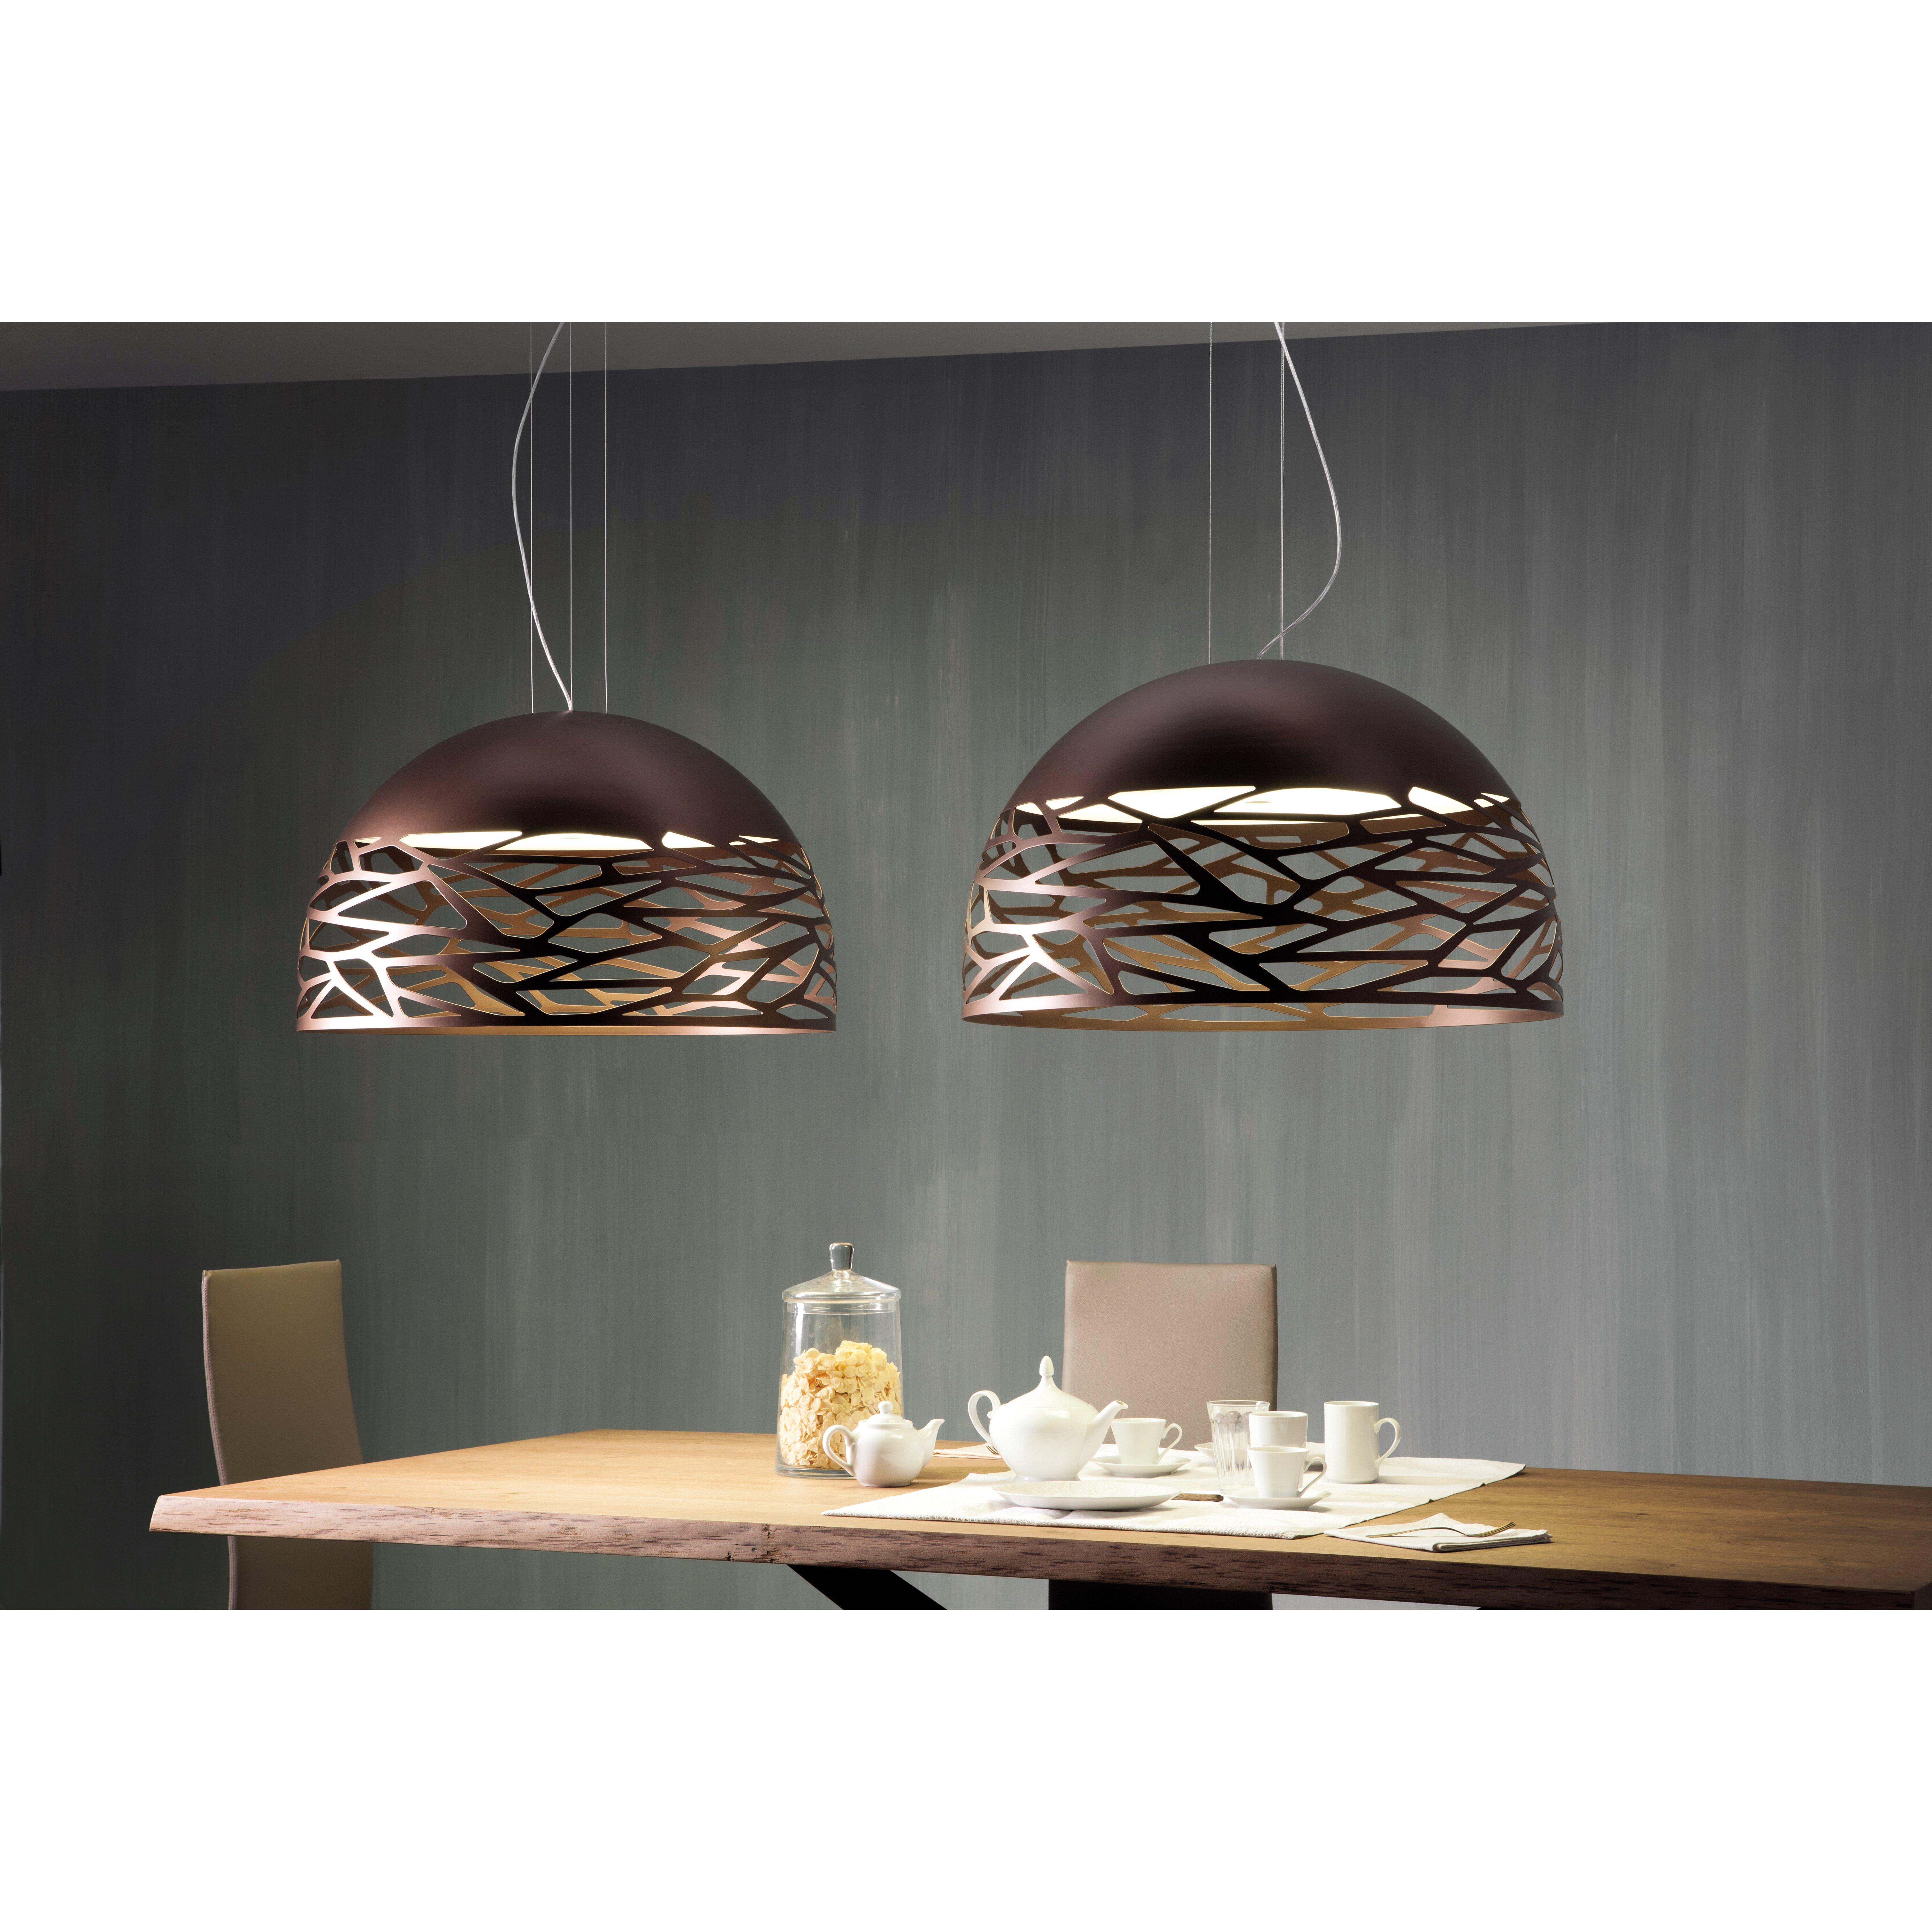 Kelly Pereira Design Studio Kitchen Inspirations: Studio Italia Design Kelly 3 Light Bowl Pendant